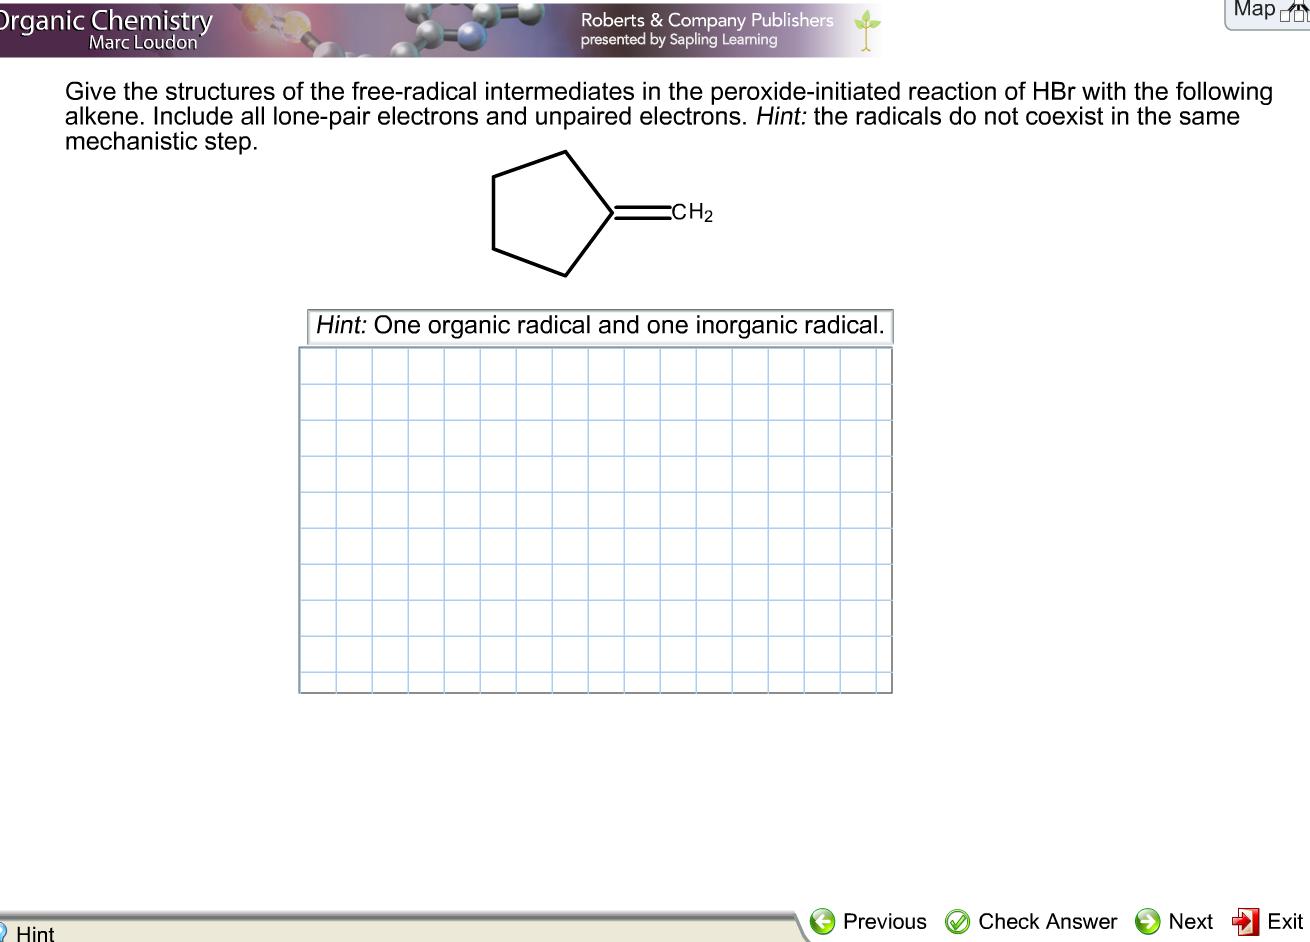 Homework HELP, Please?